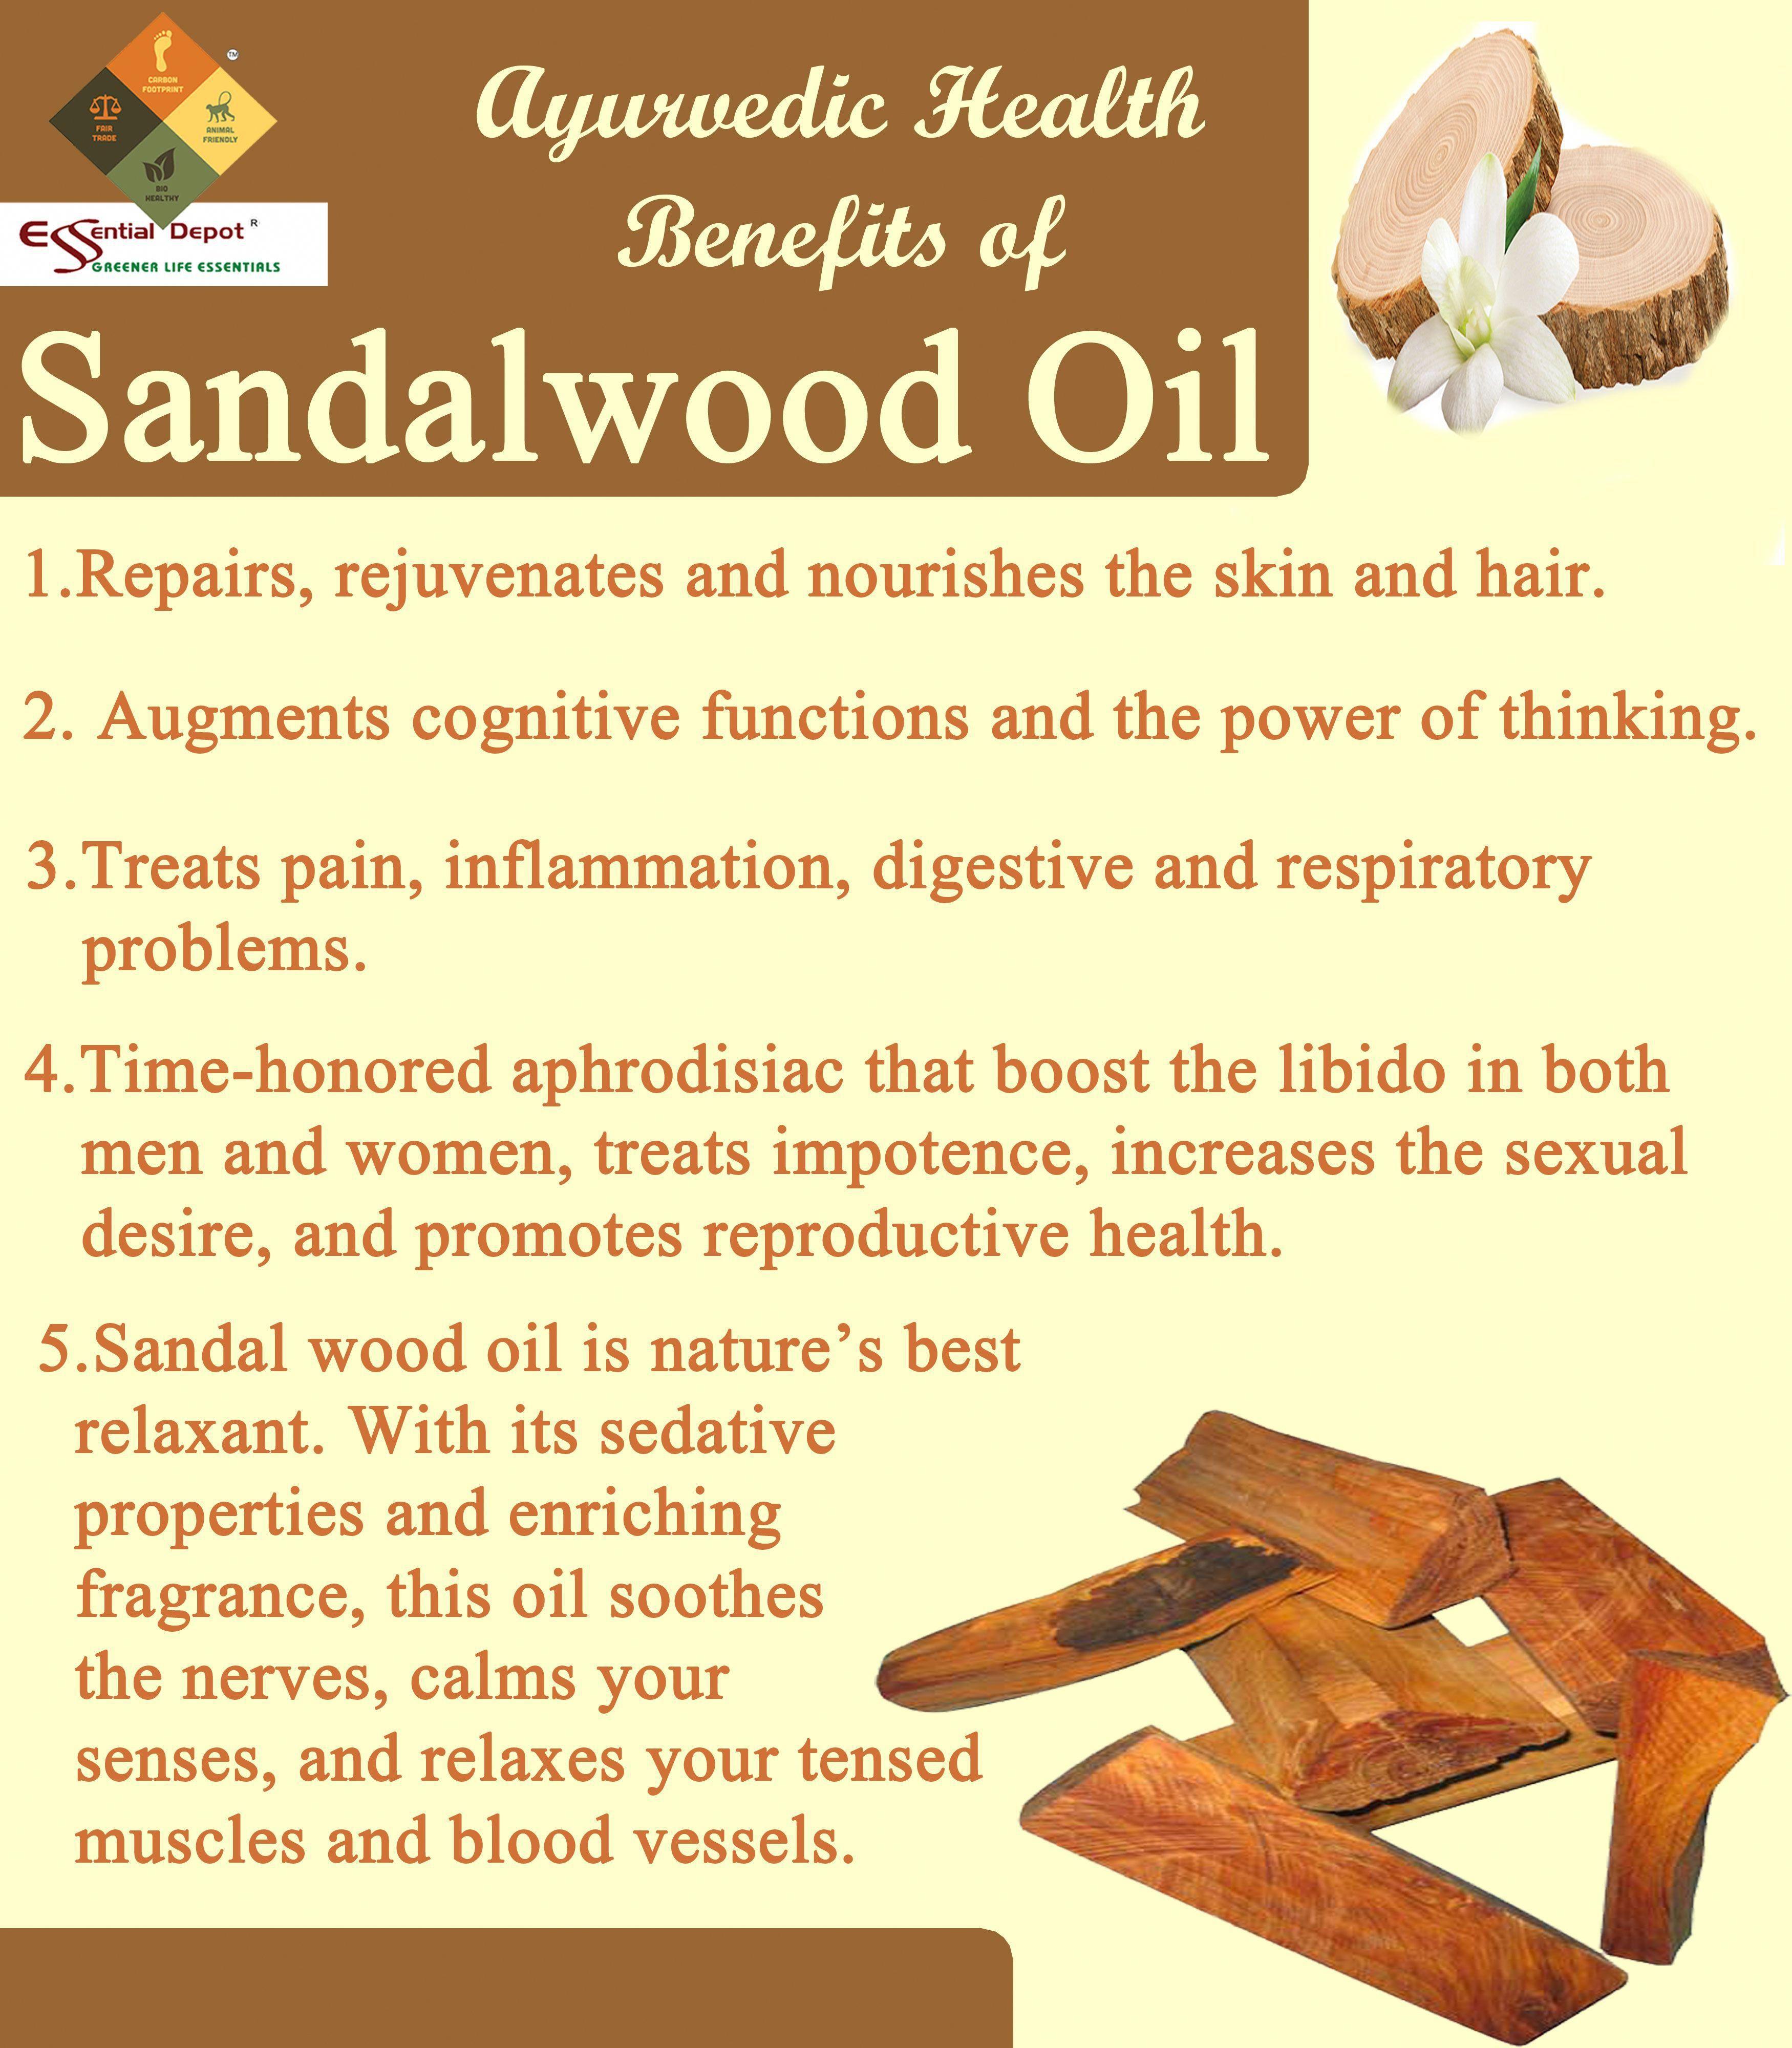 Ayurvedic health benefits of Sandalwood oil | Ayurvedic ...